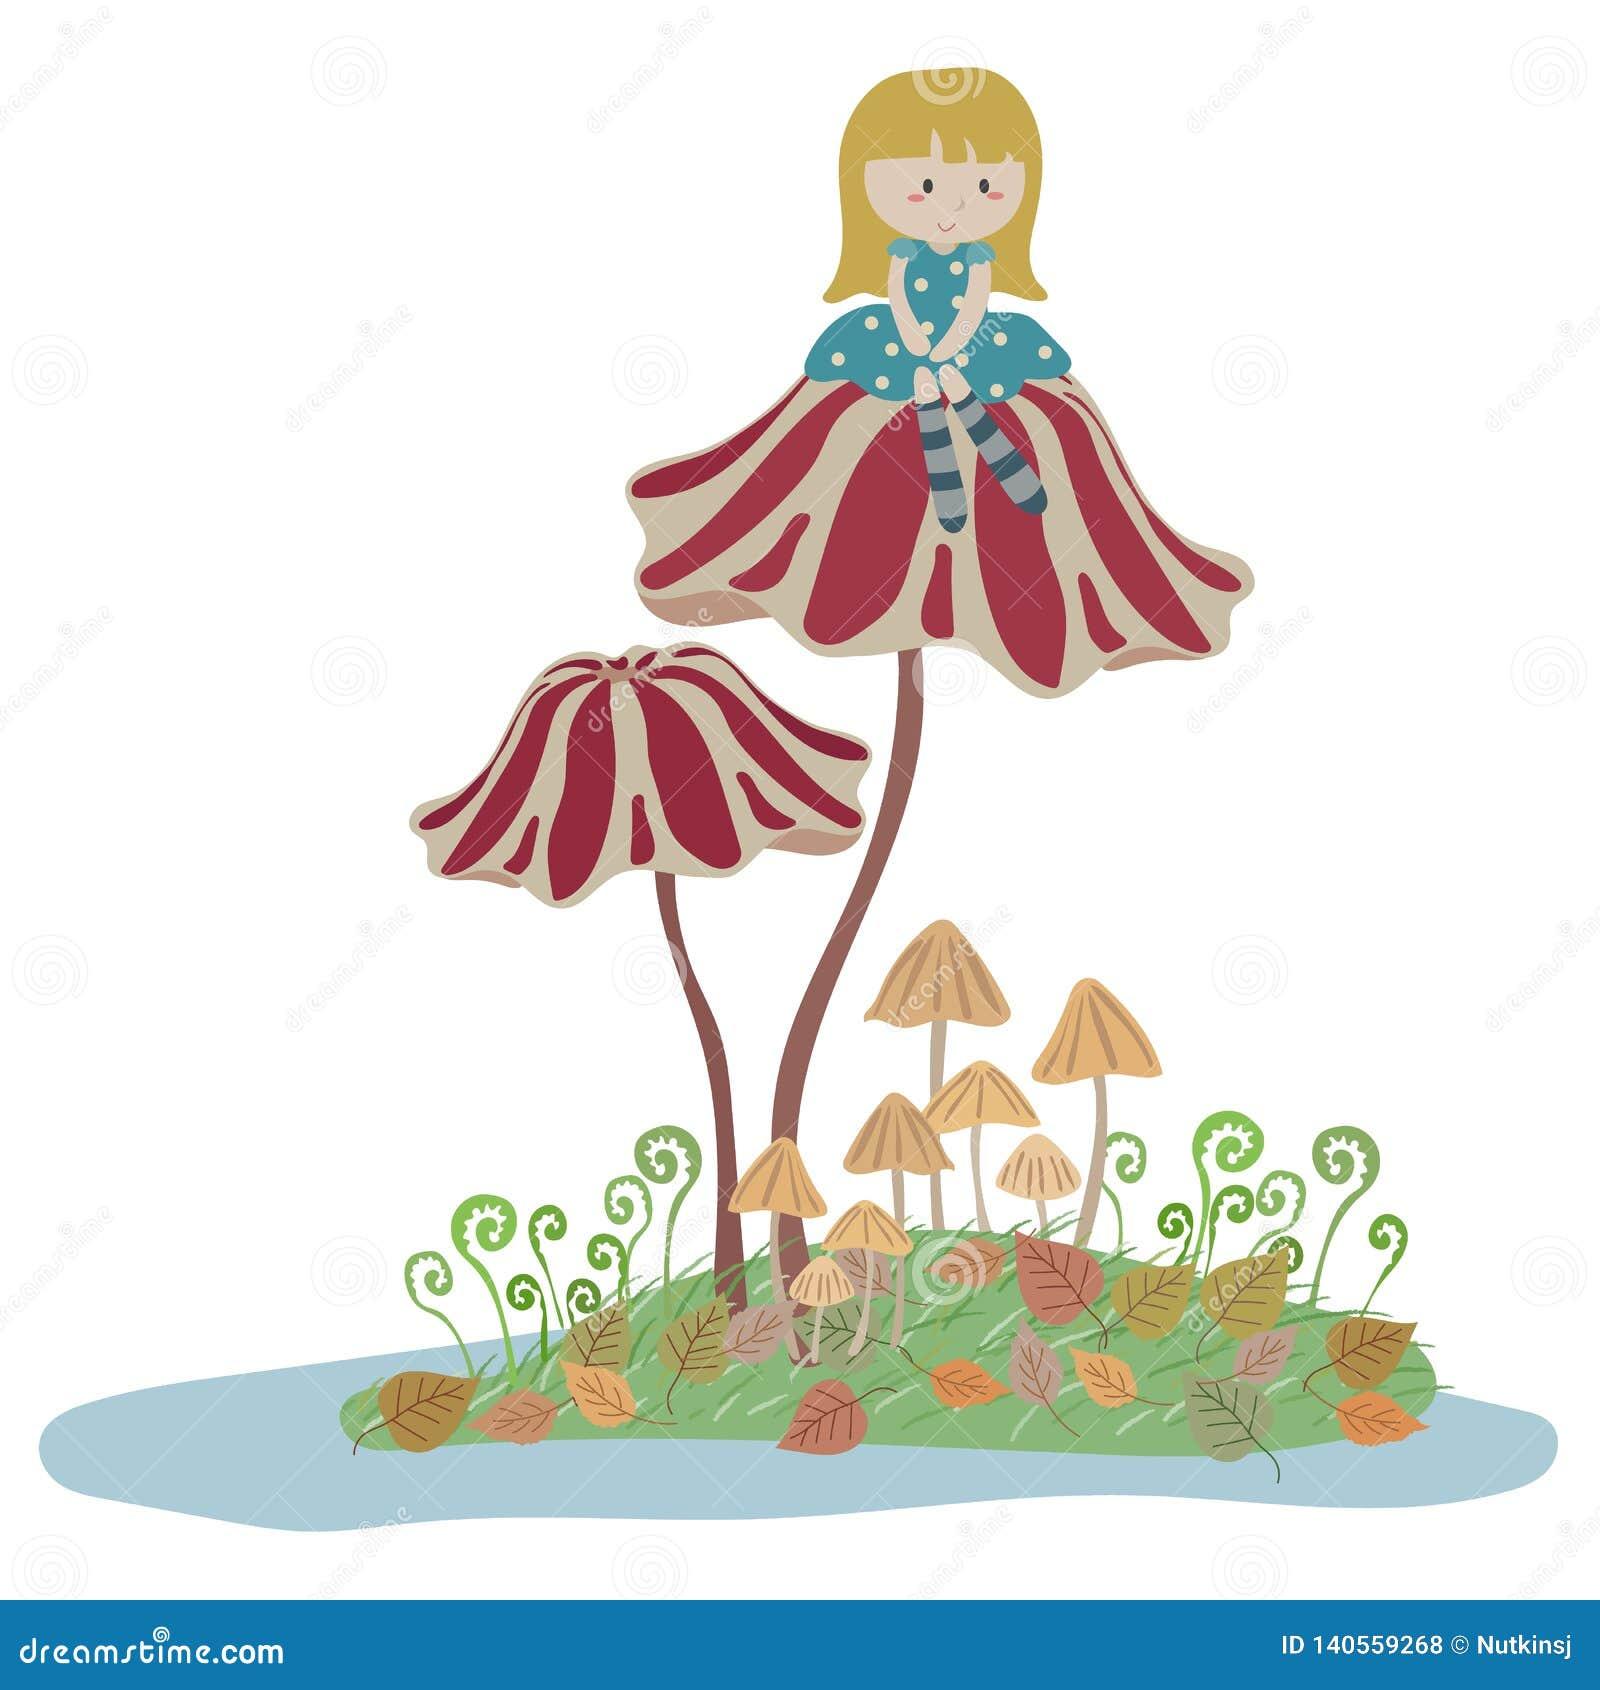 Thumbelina stock vector. Illustration of pastel, princess ...